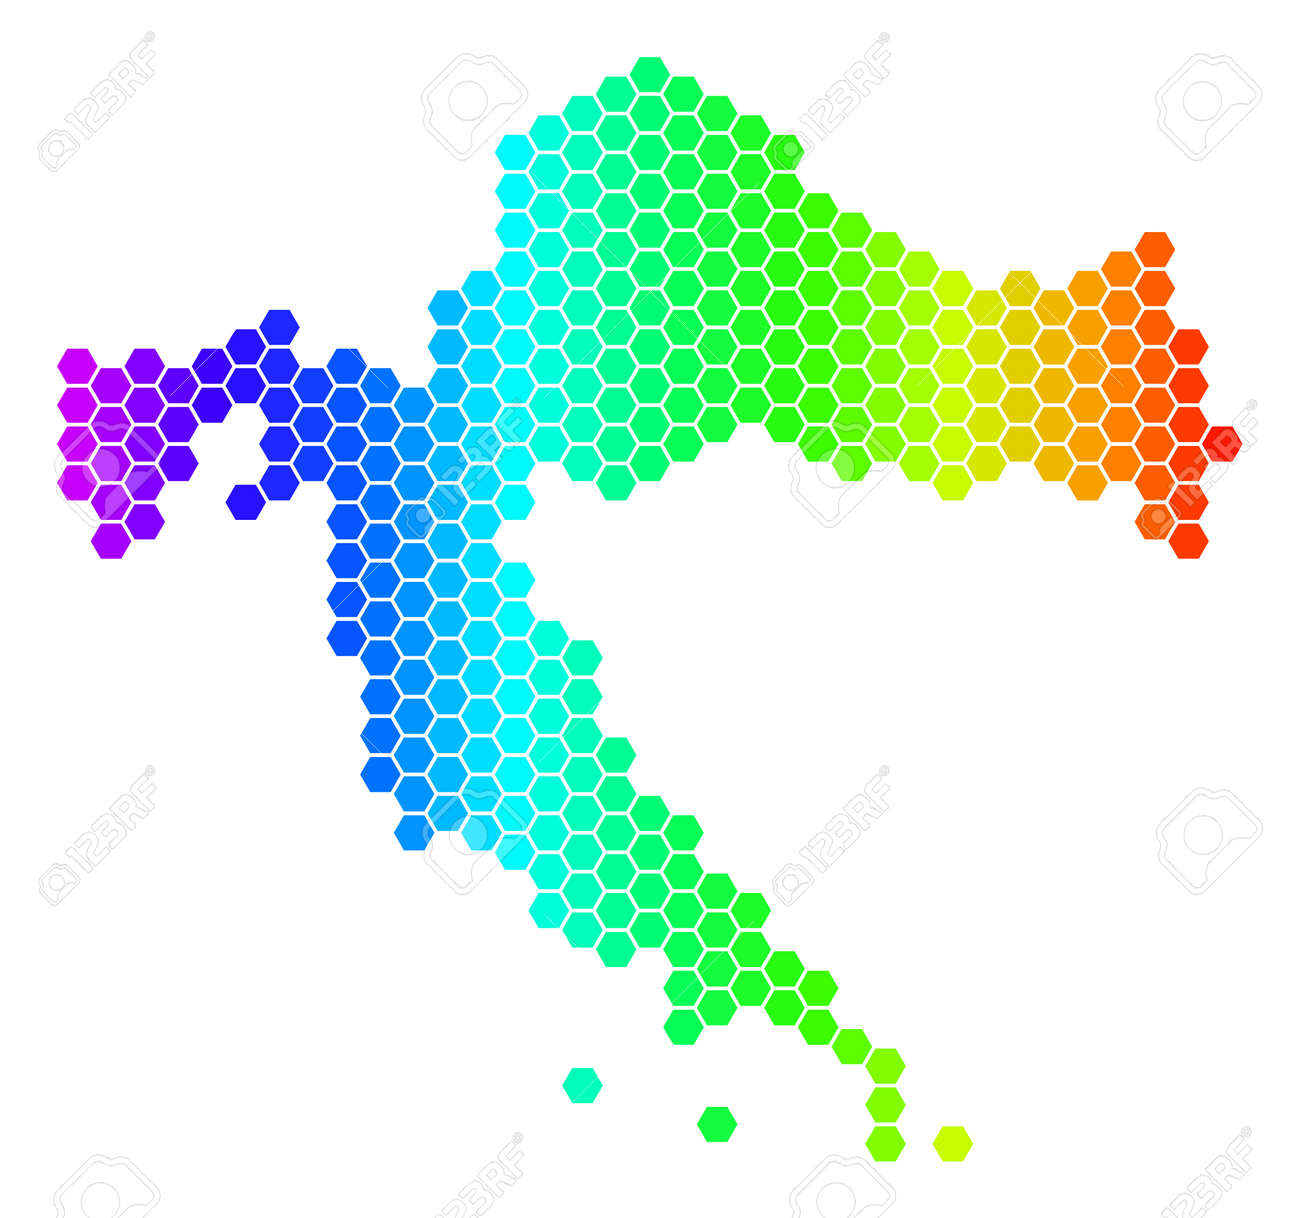 Hexagon Spectrum Croatia Map. Vector Geographic Map In Bright ...